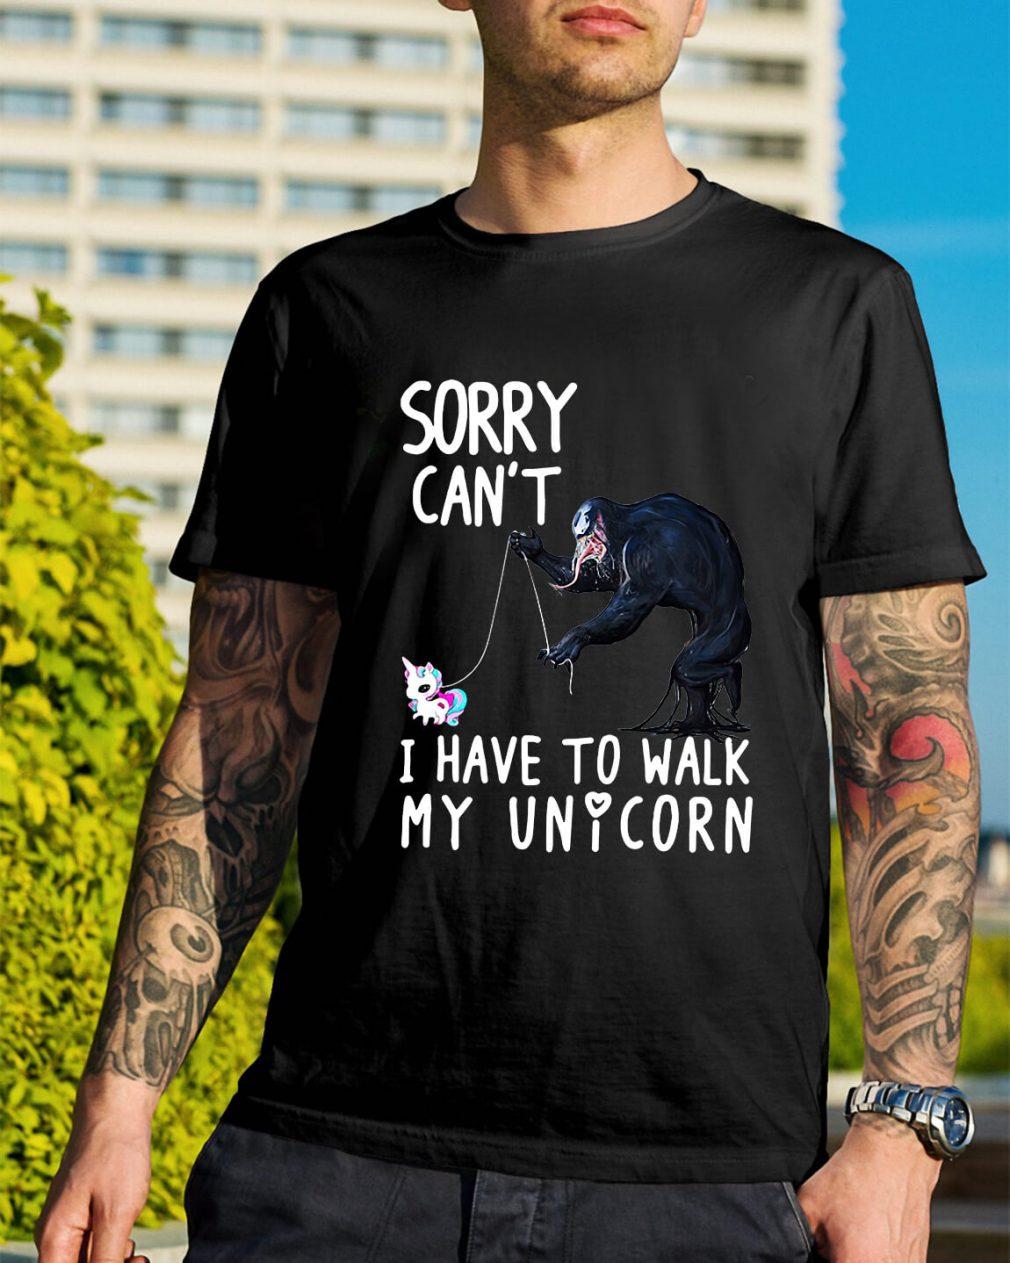 Venom sorry can't I have to walk my unicorn shirt